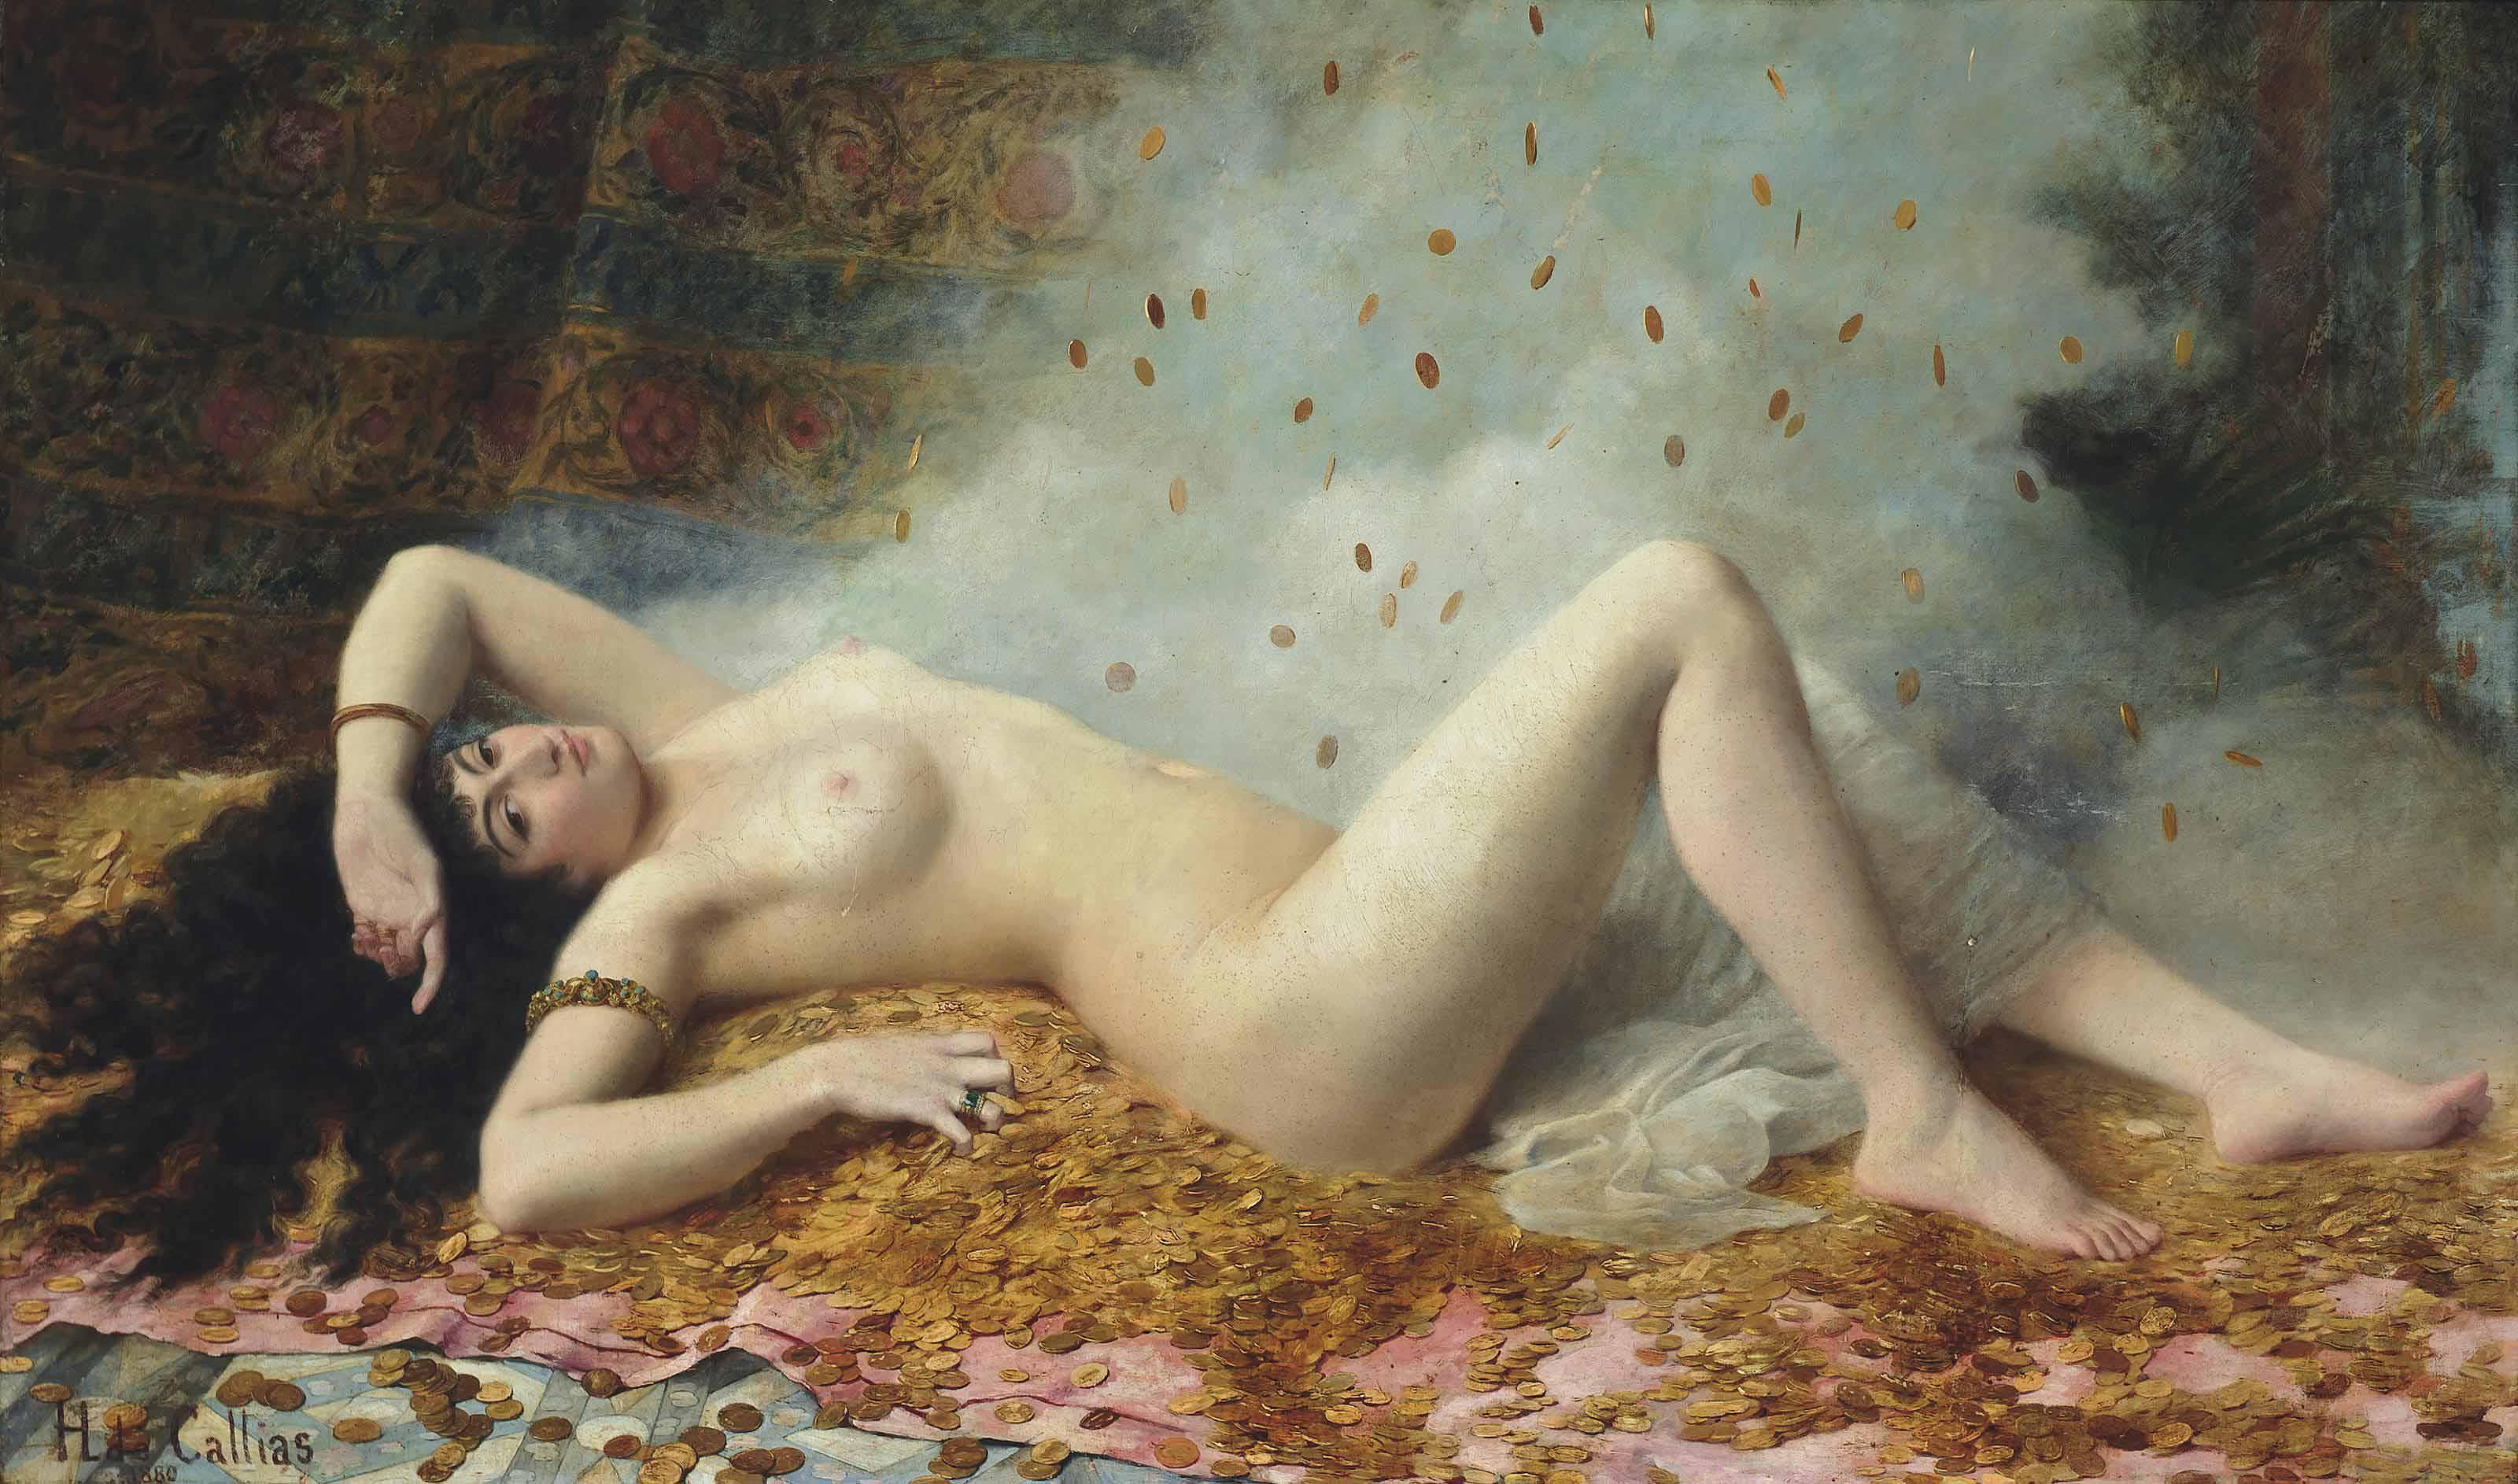 Horace De Callias (FRENCH, 184